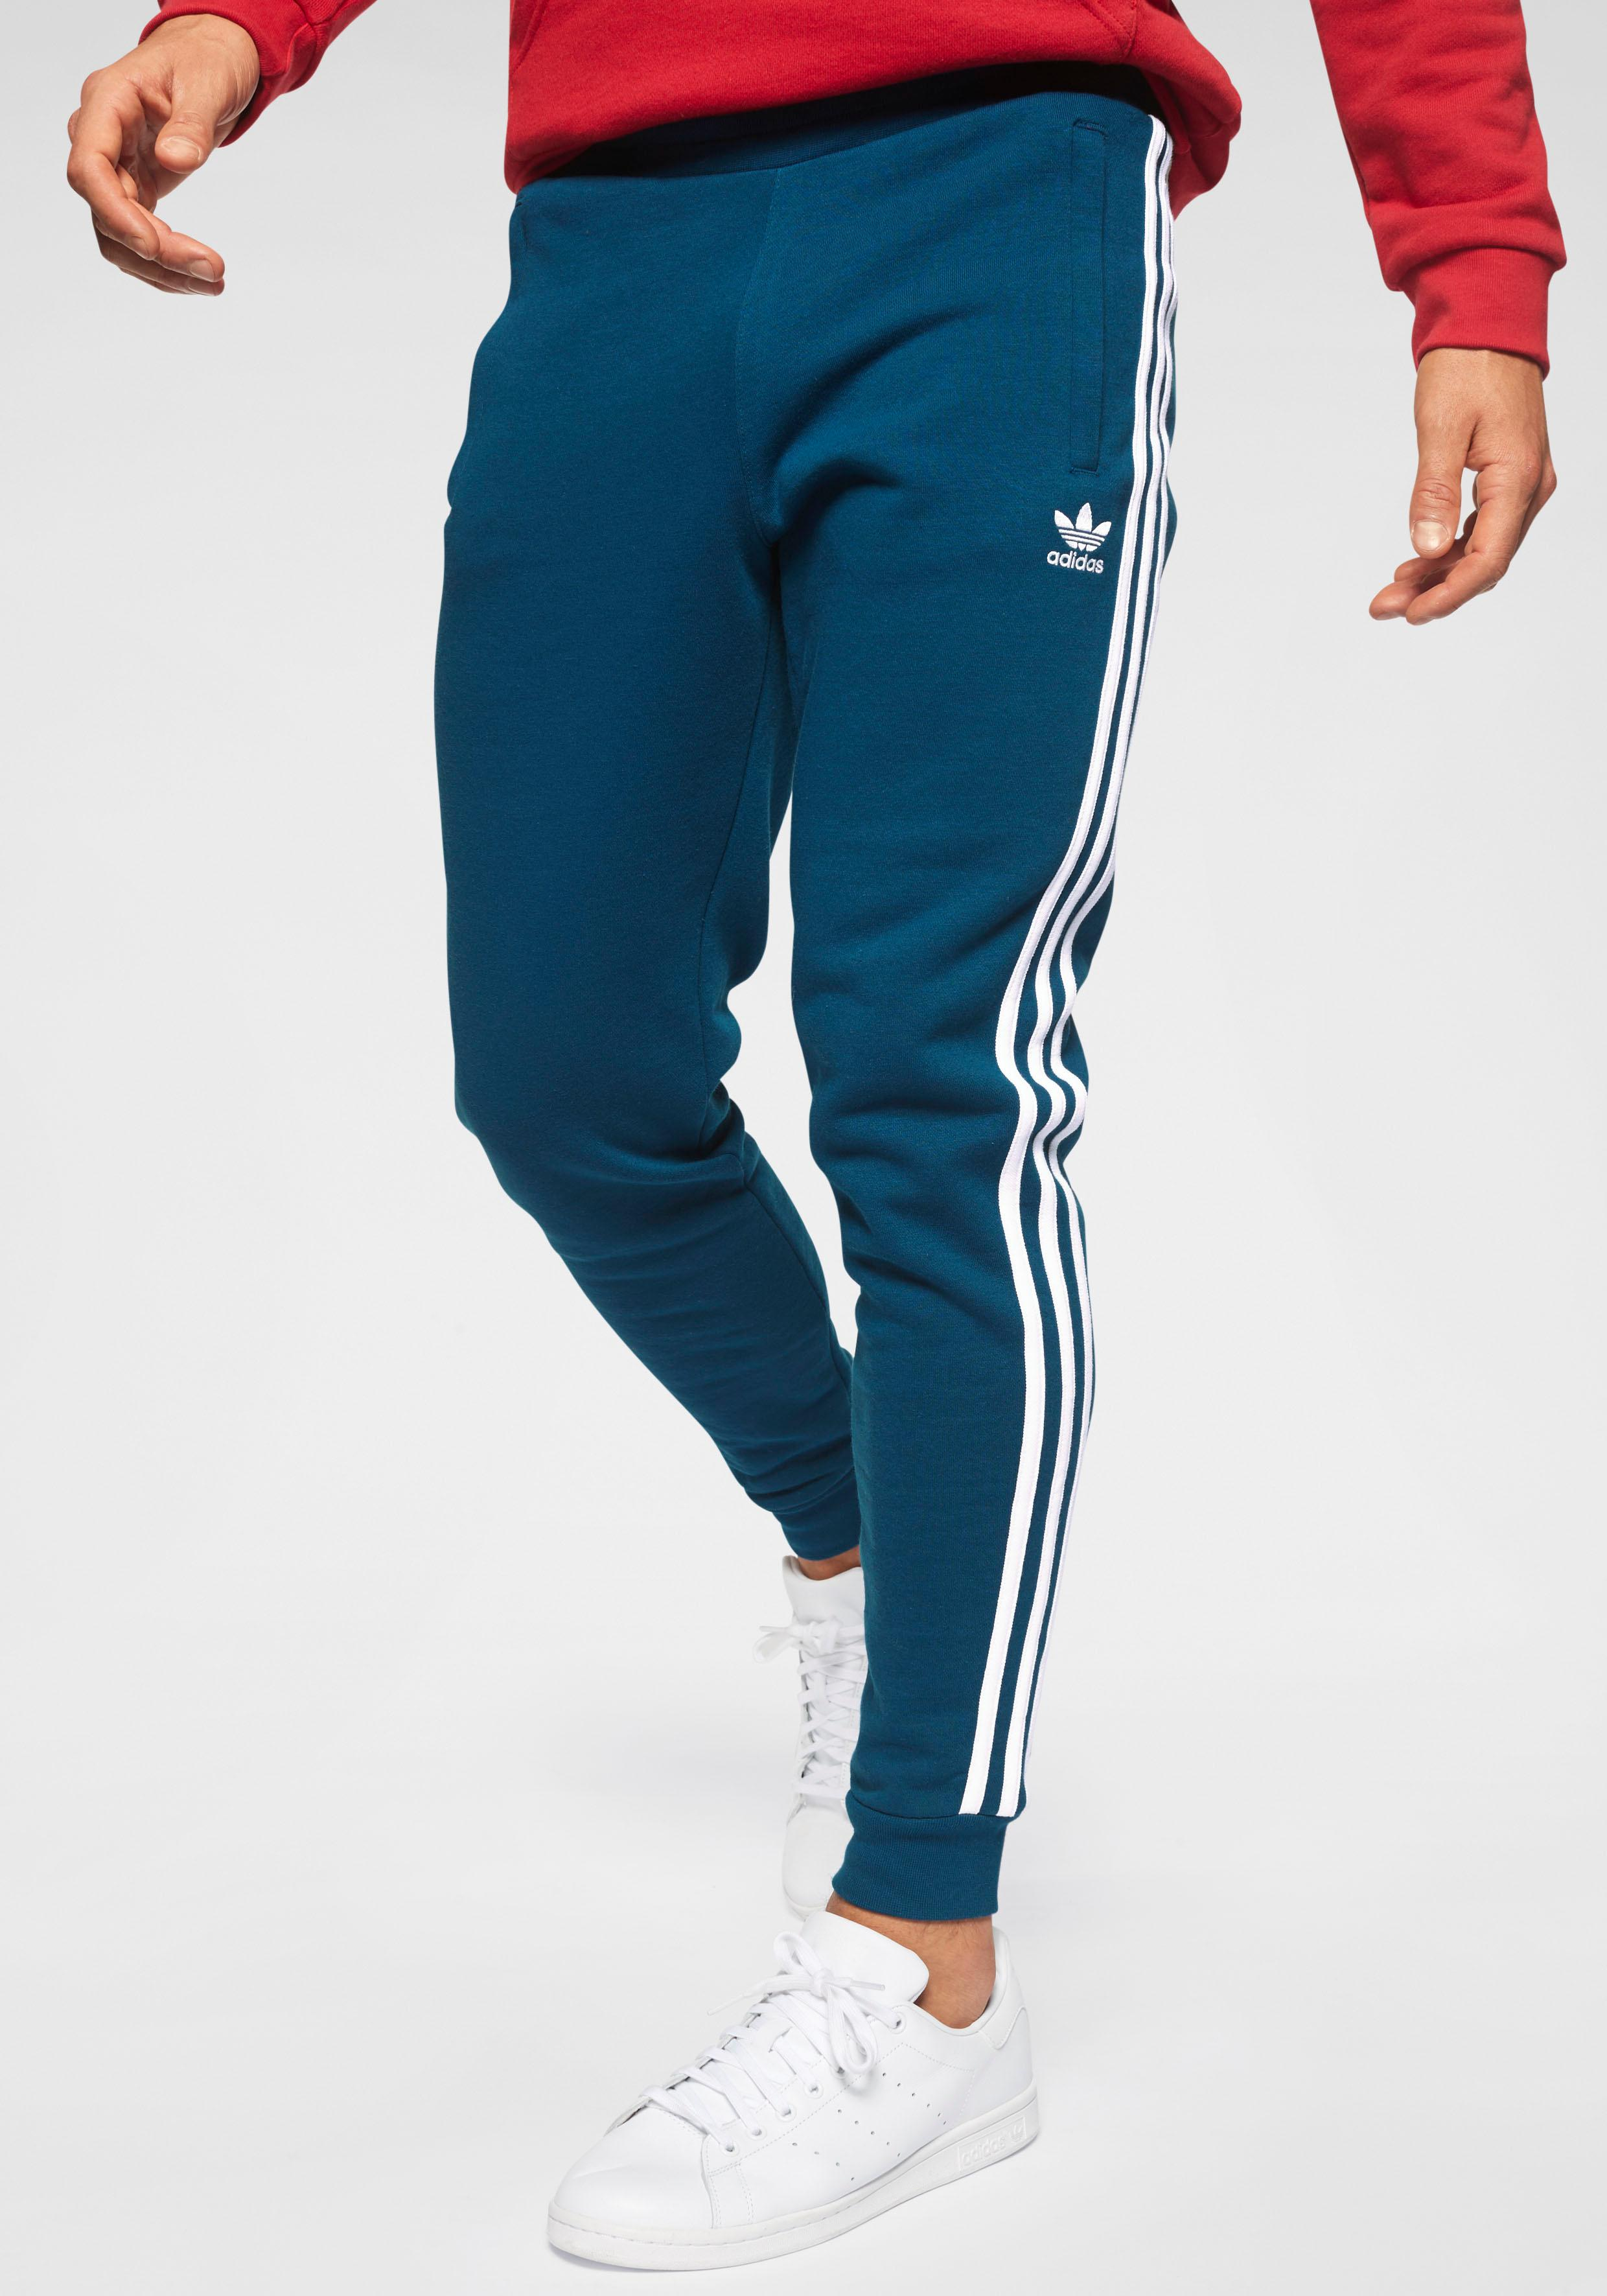 21fa146896eccb adidas Originals Jogginghose »3-STRIPES PANT« kaufen » BAUR